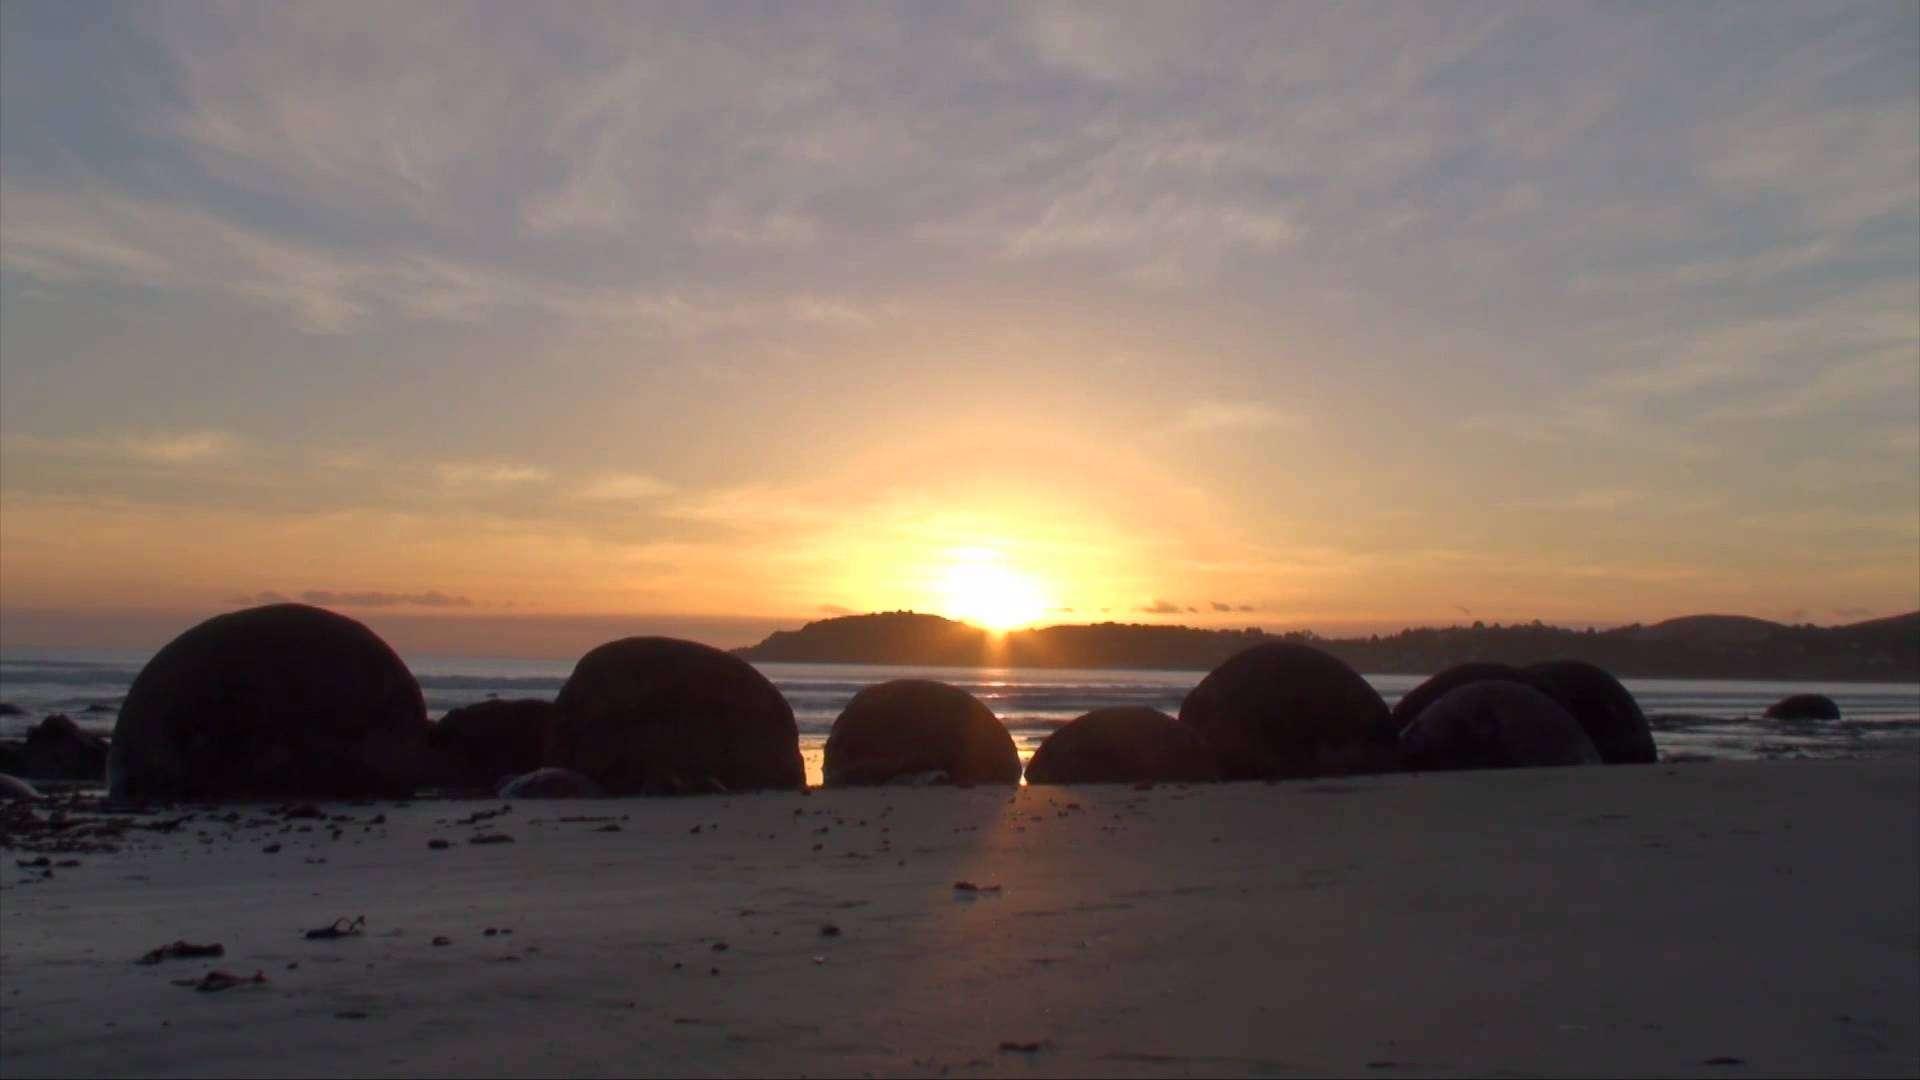 Moeraki Boulders Sunrise | Löhstana David - Cerises - YouTube